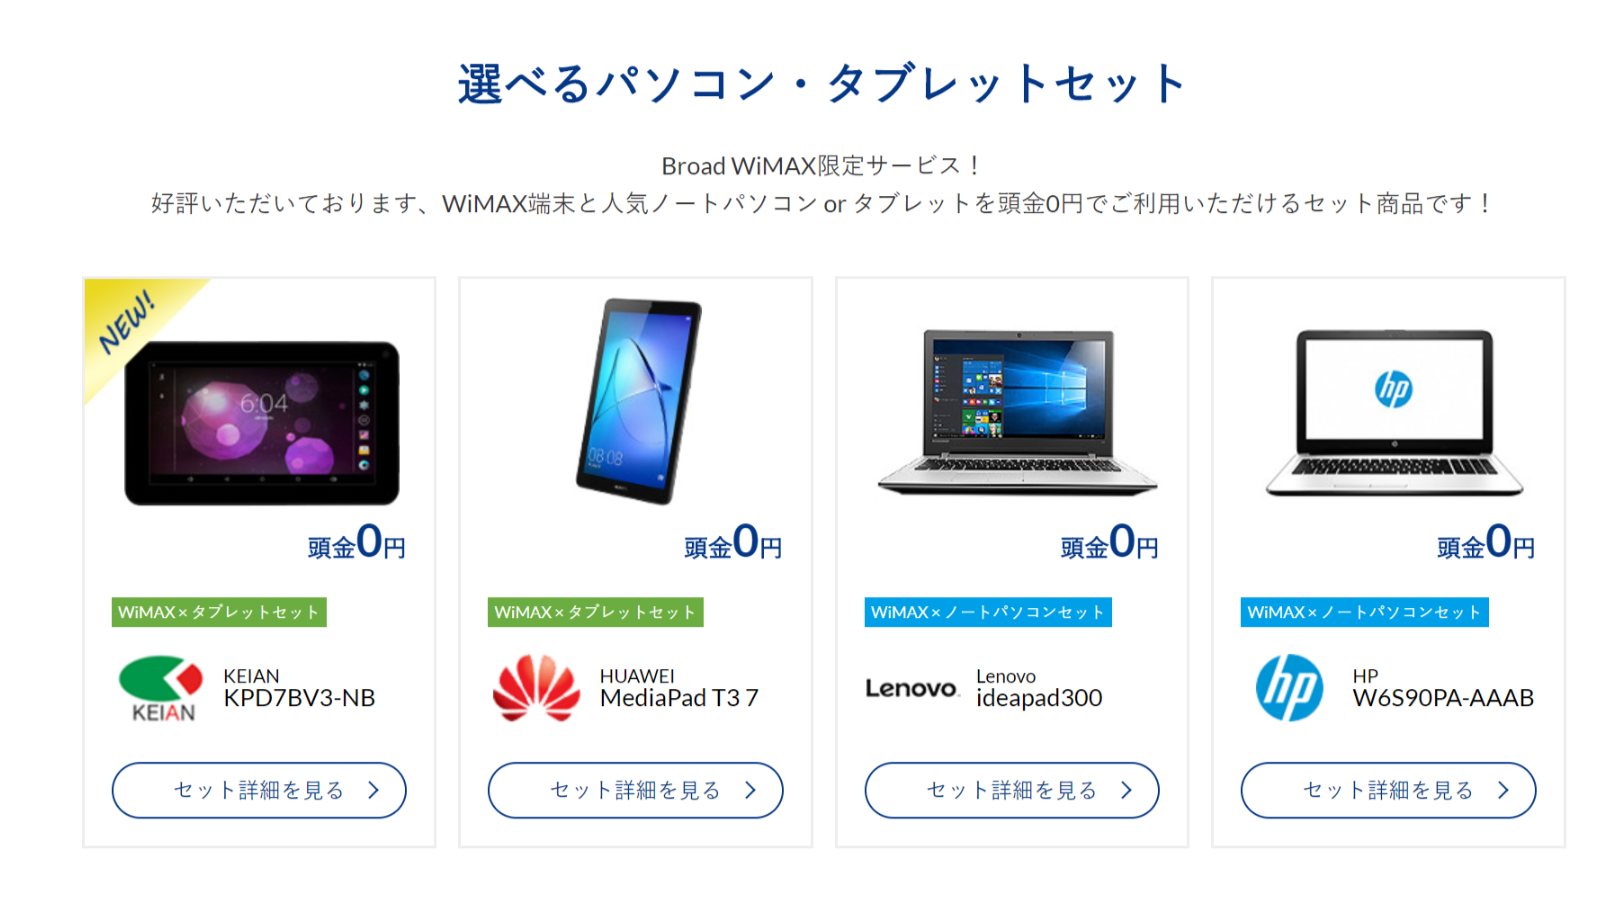 pc0円のBroadWiMAX